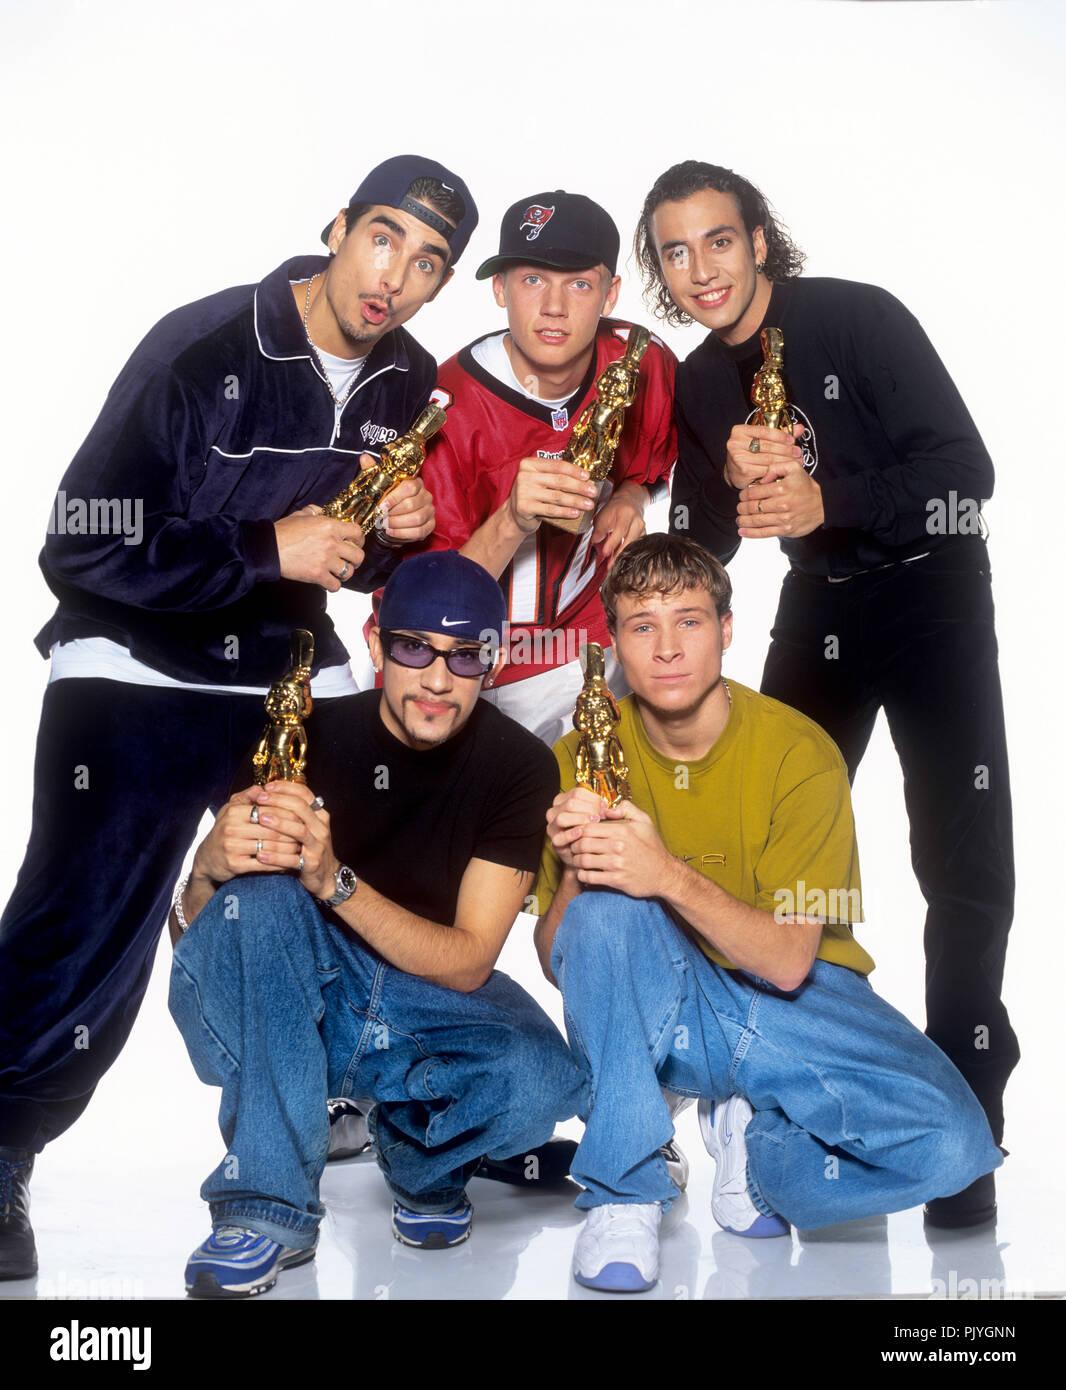 Backstreet Boys (l-r): Kevin Richardson, Alexander James McLean, Nick Carter, Brian Littrell, Howie Dorough on 15.07.1998 in Washington. | usage worldwide - Stock Image